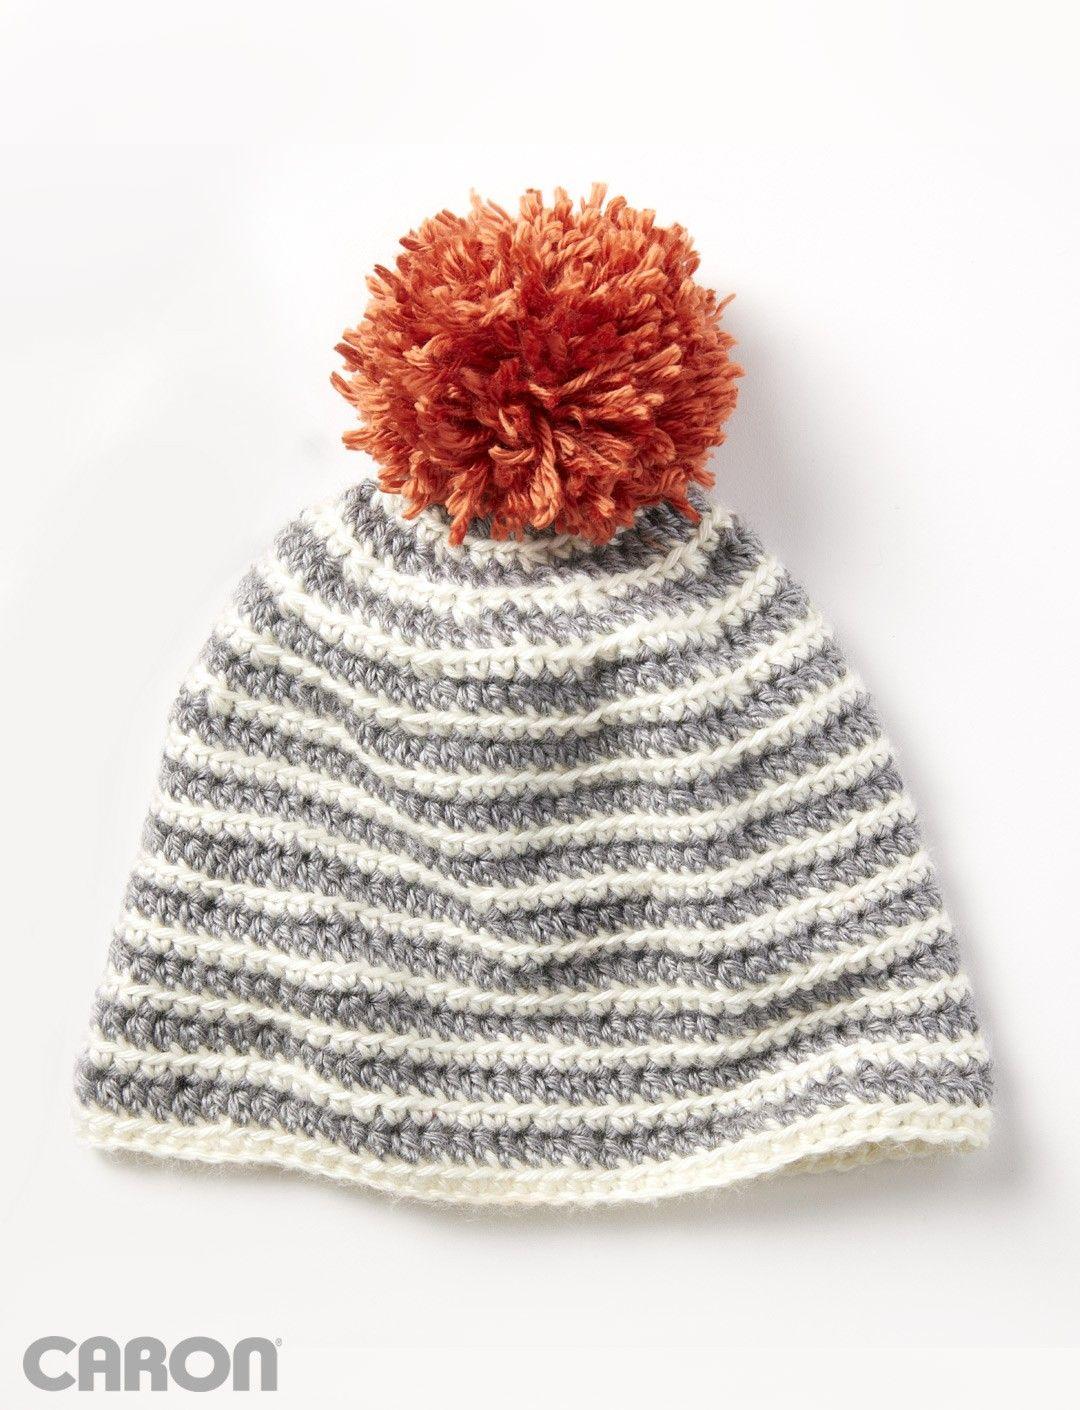 Yarnspirations.com - Caron Striped Right Hat - Patterns ...